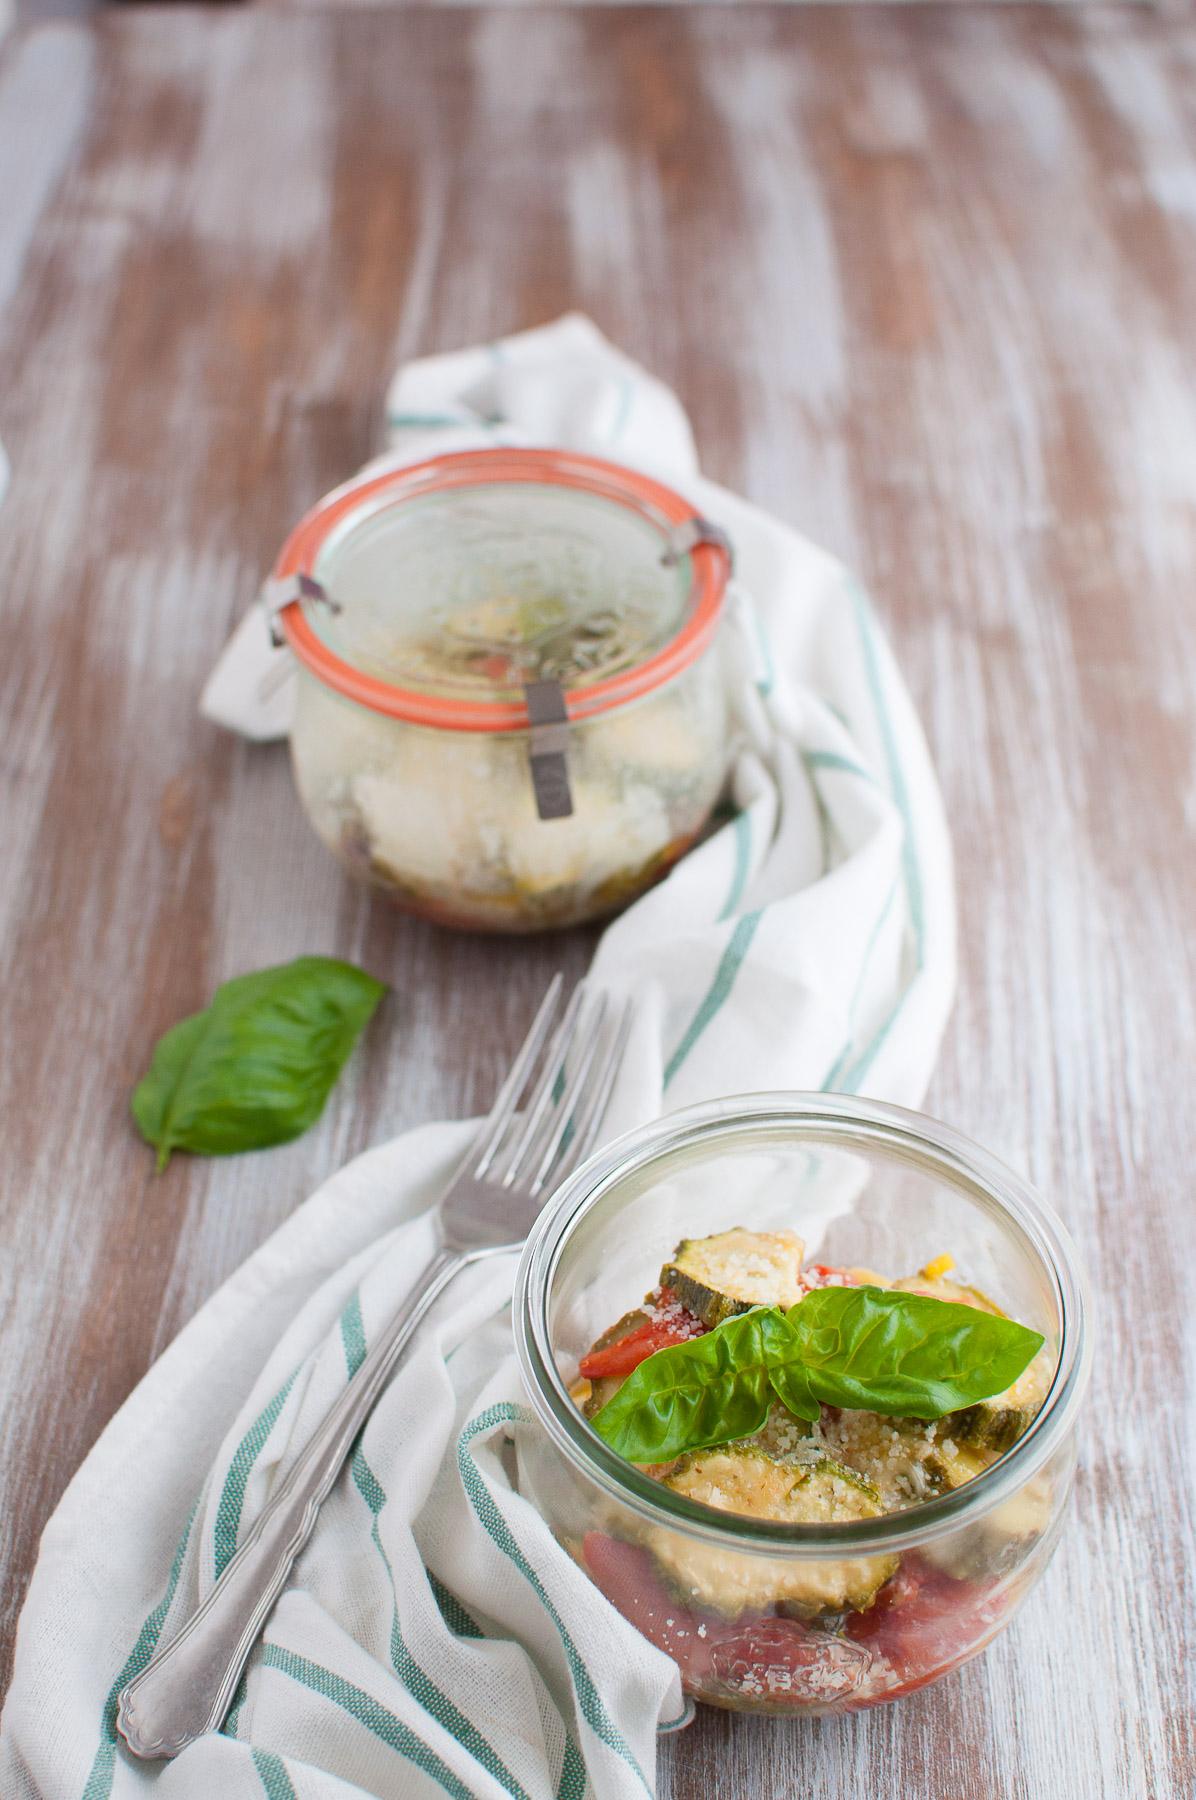 Parmigiana di zucchine in vasocottura microonde